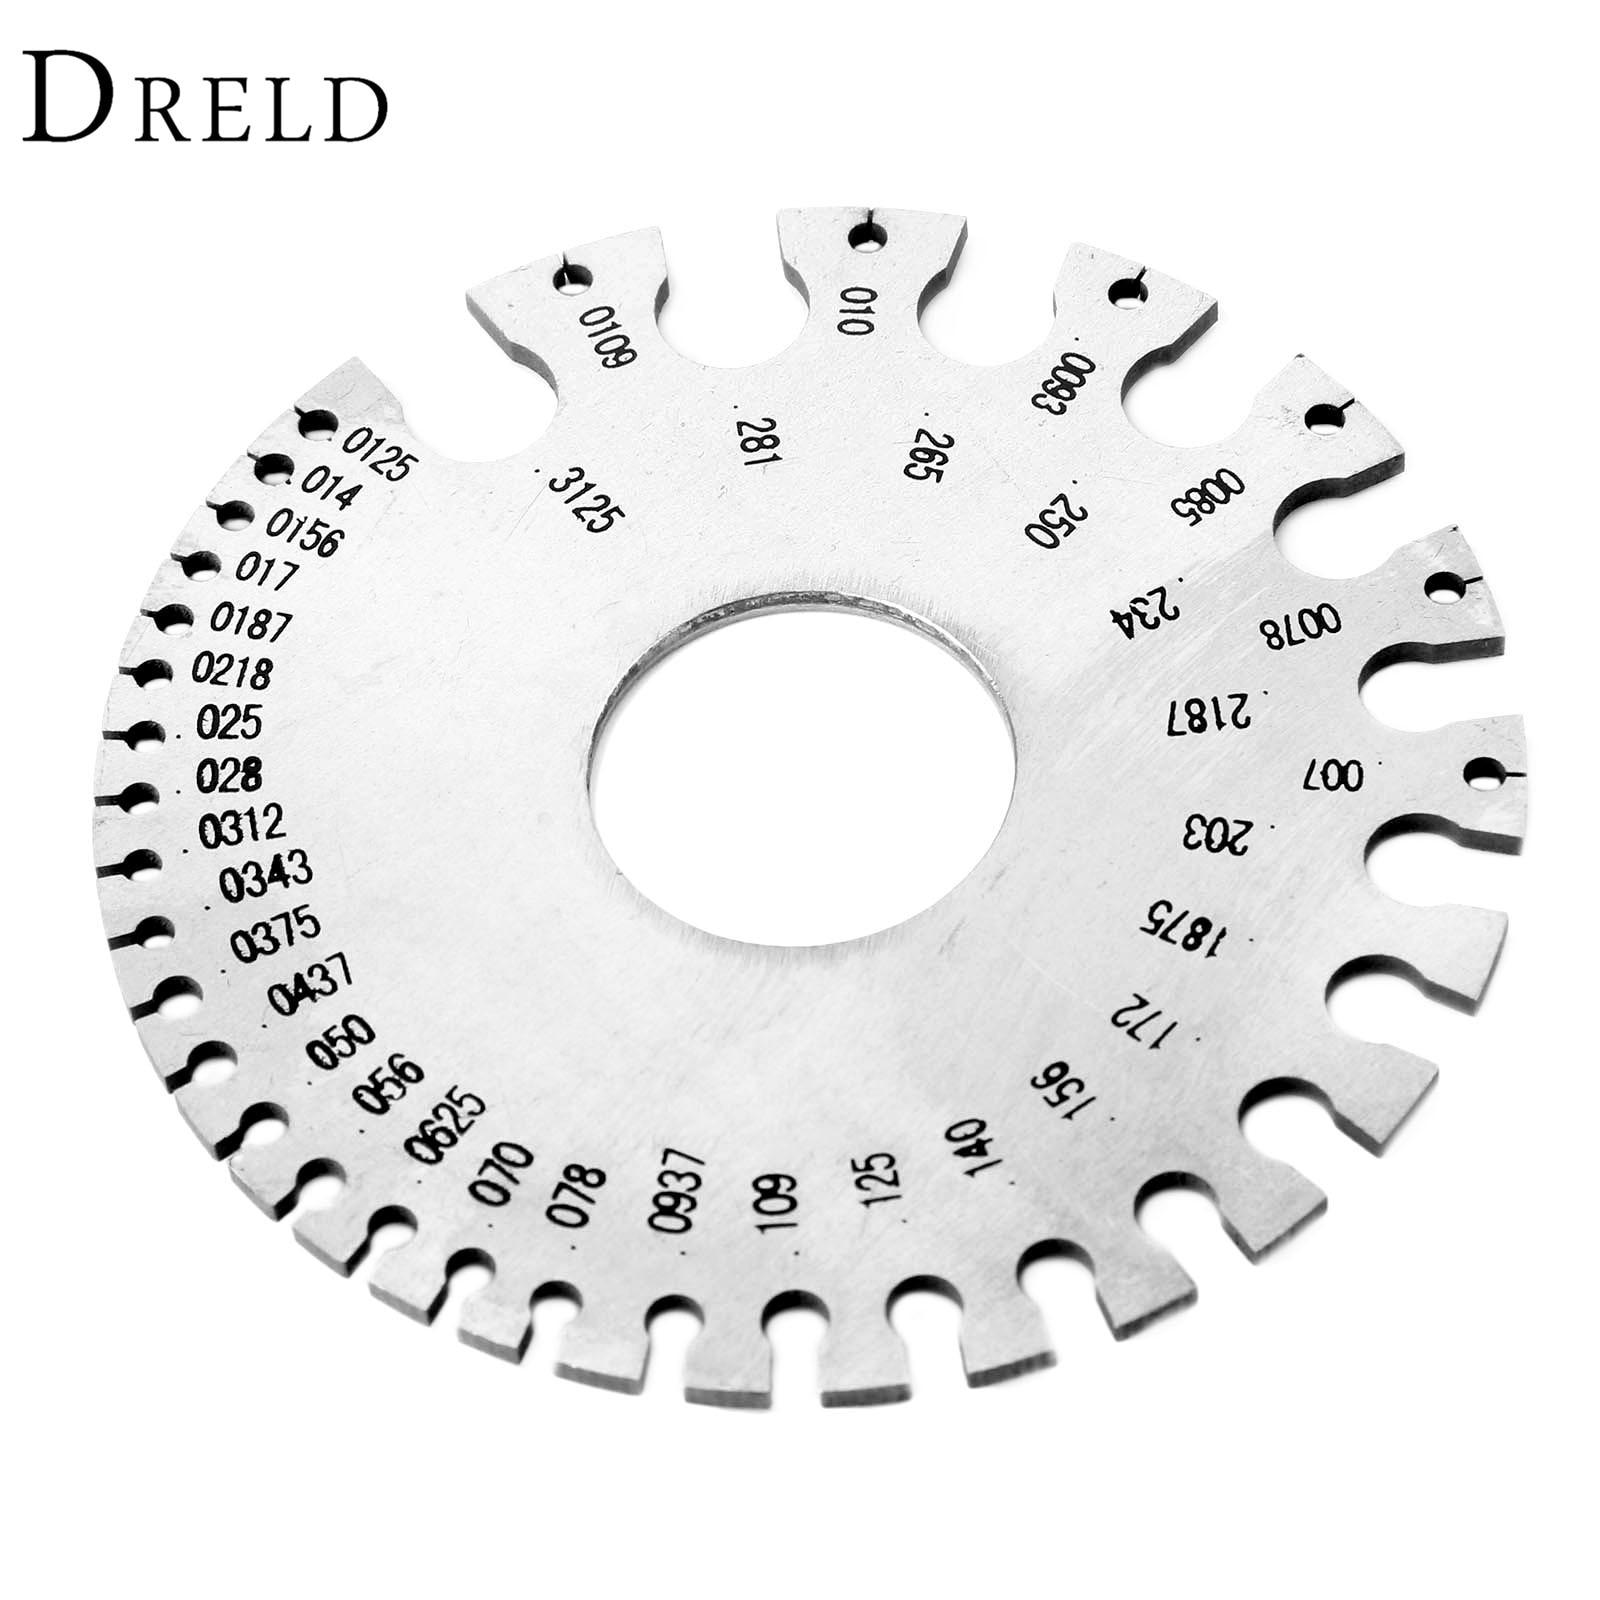 small resolution of dreld 0 36 stainless steel wire gauge weld diameter gauge welding inspection inch measuring gauges fpr measurement tool with bag